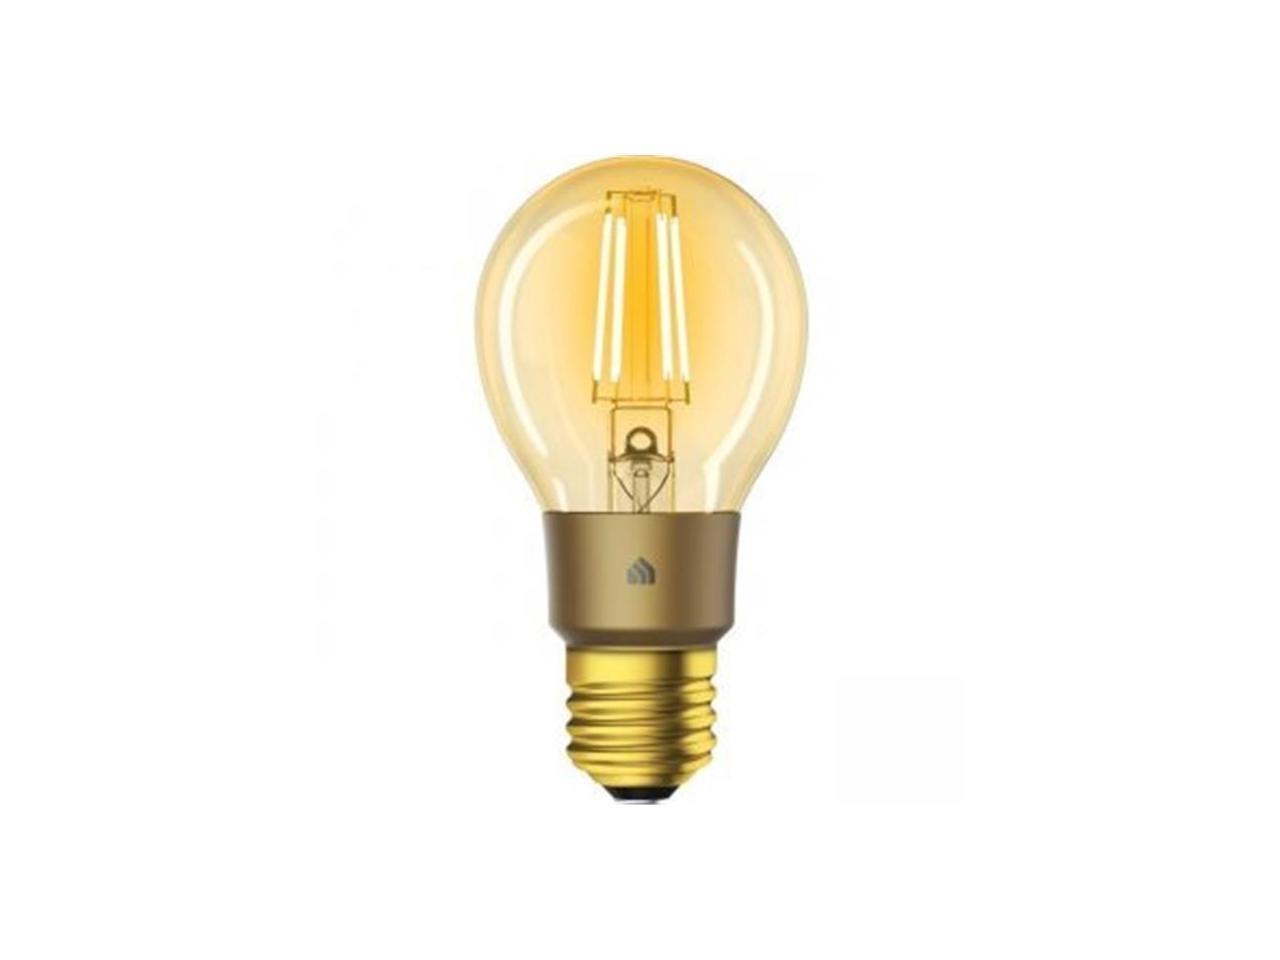 TP Link Kasa KL50 Wifi Filament Smart Bulb Soft White